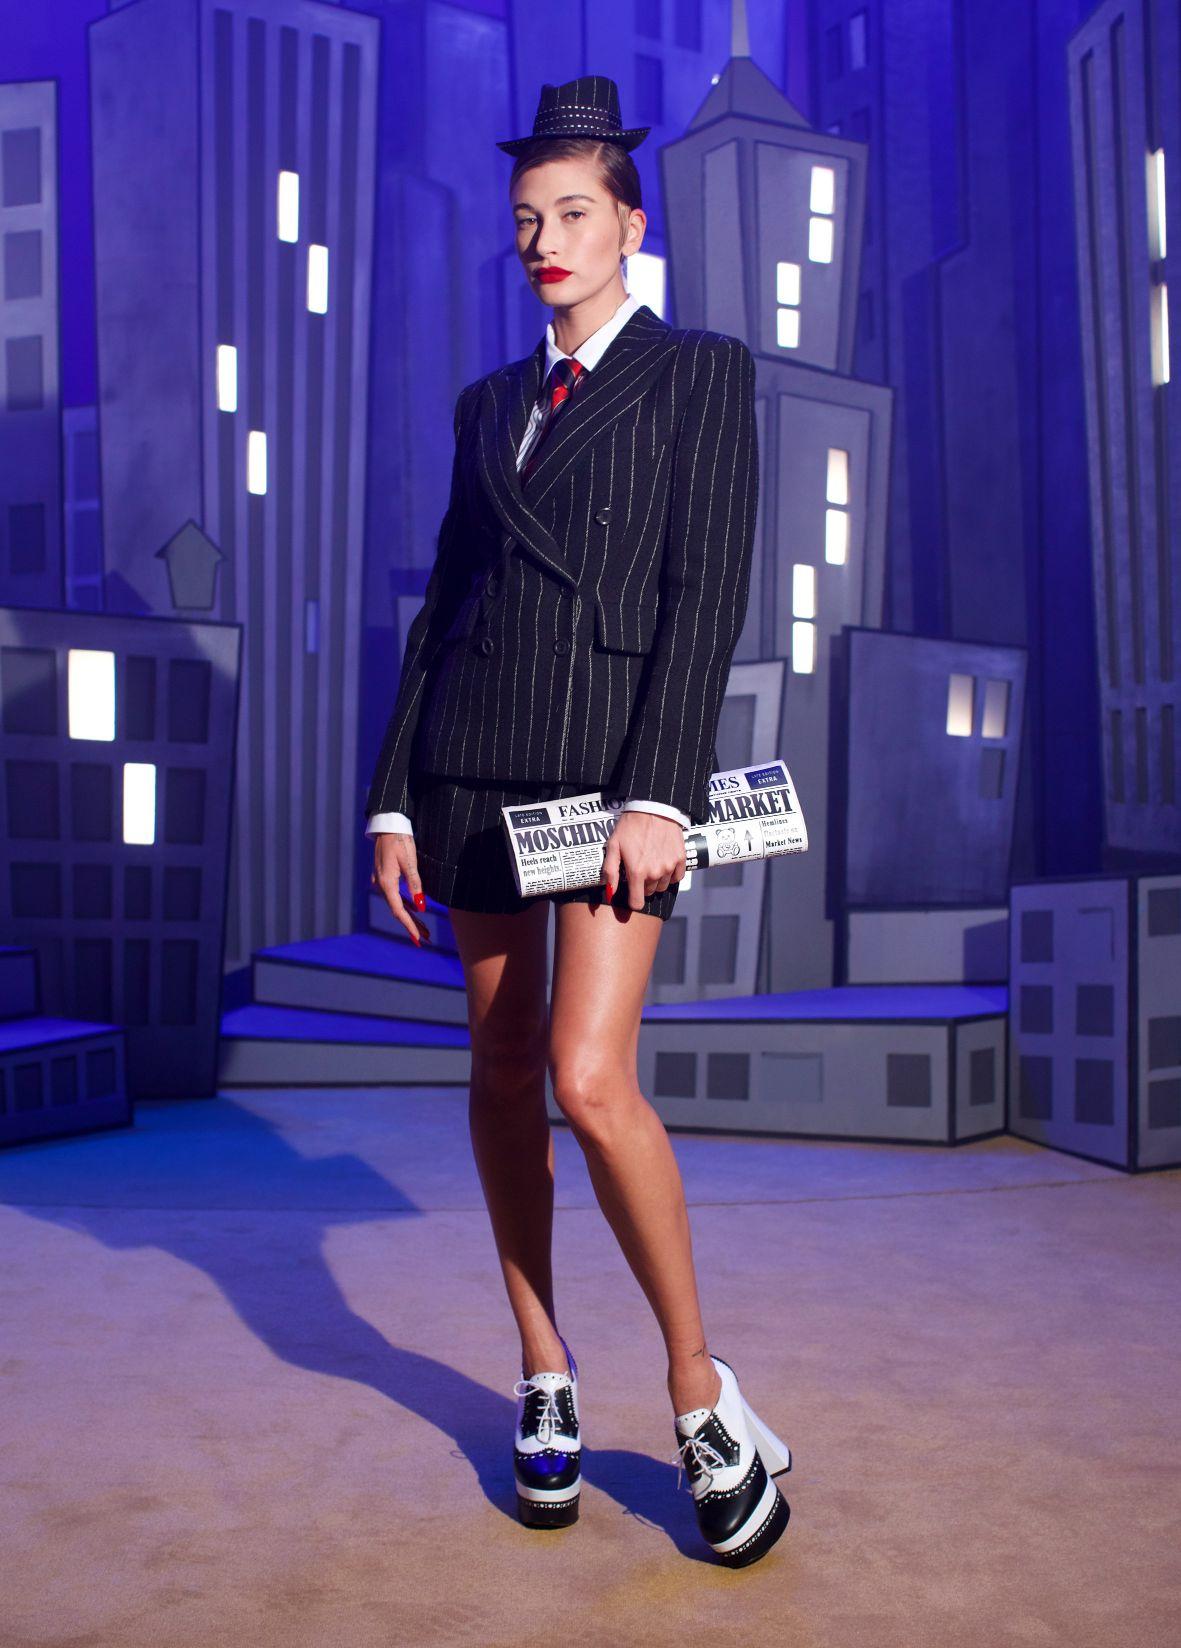 milan-fashion-week--moschino-autumn-winter-2022-collection-Milan_Fashion_Week_Moschin__2022___(3).jpg